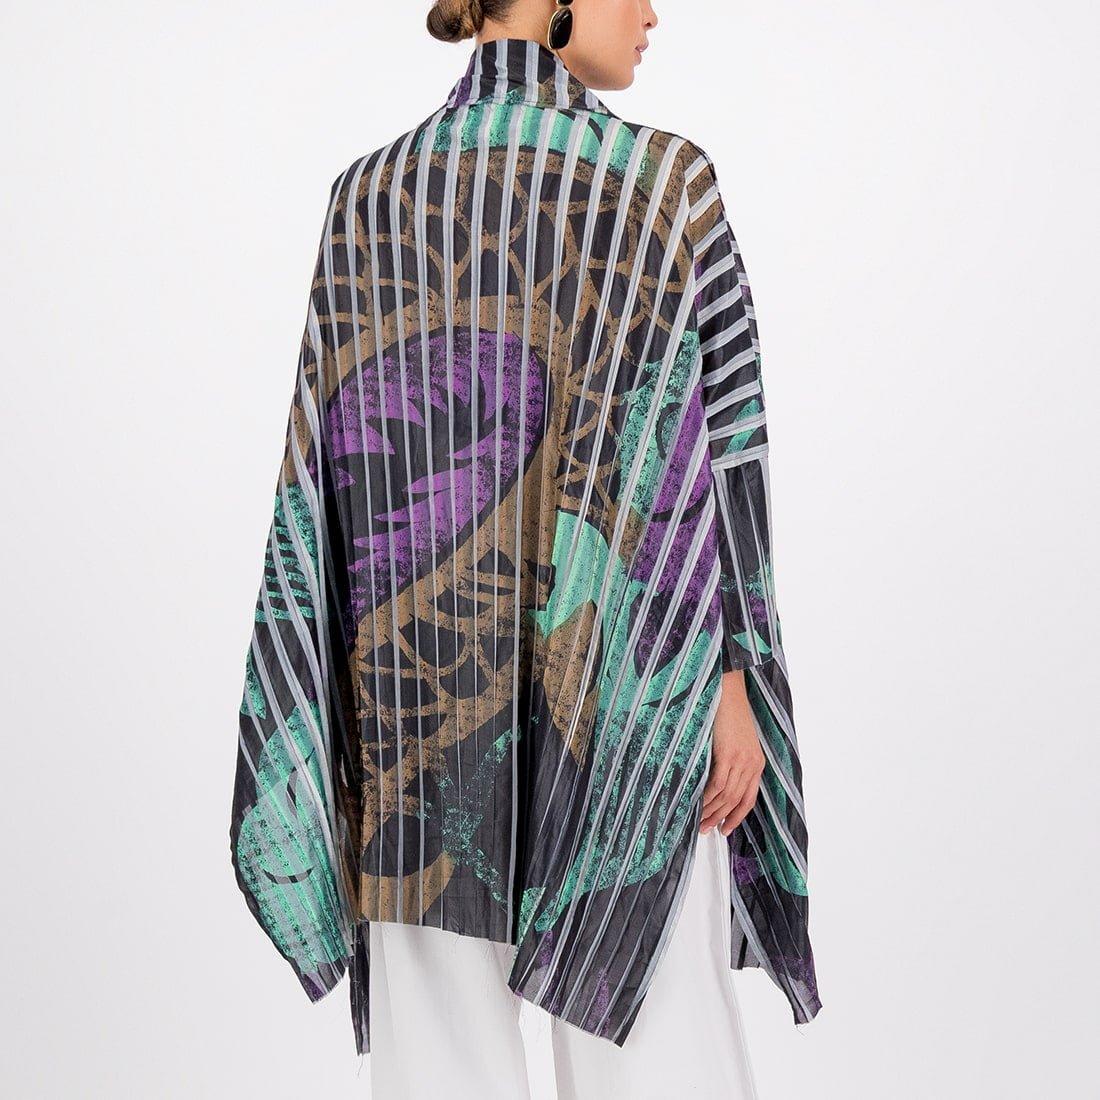 Long-sleeved party kimono 2